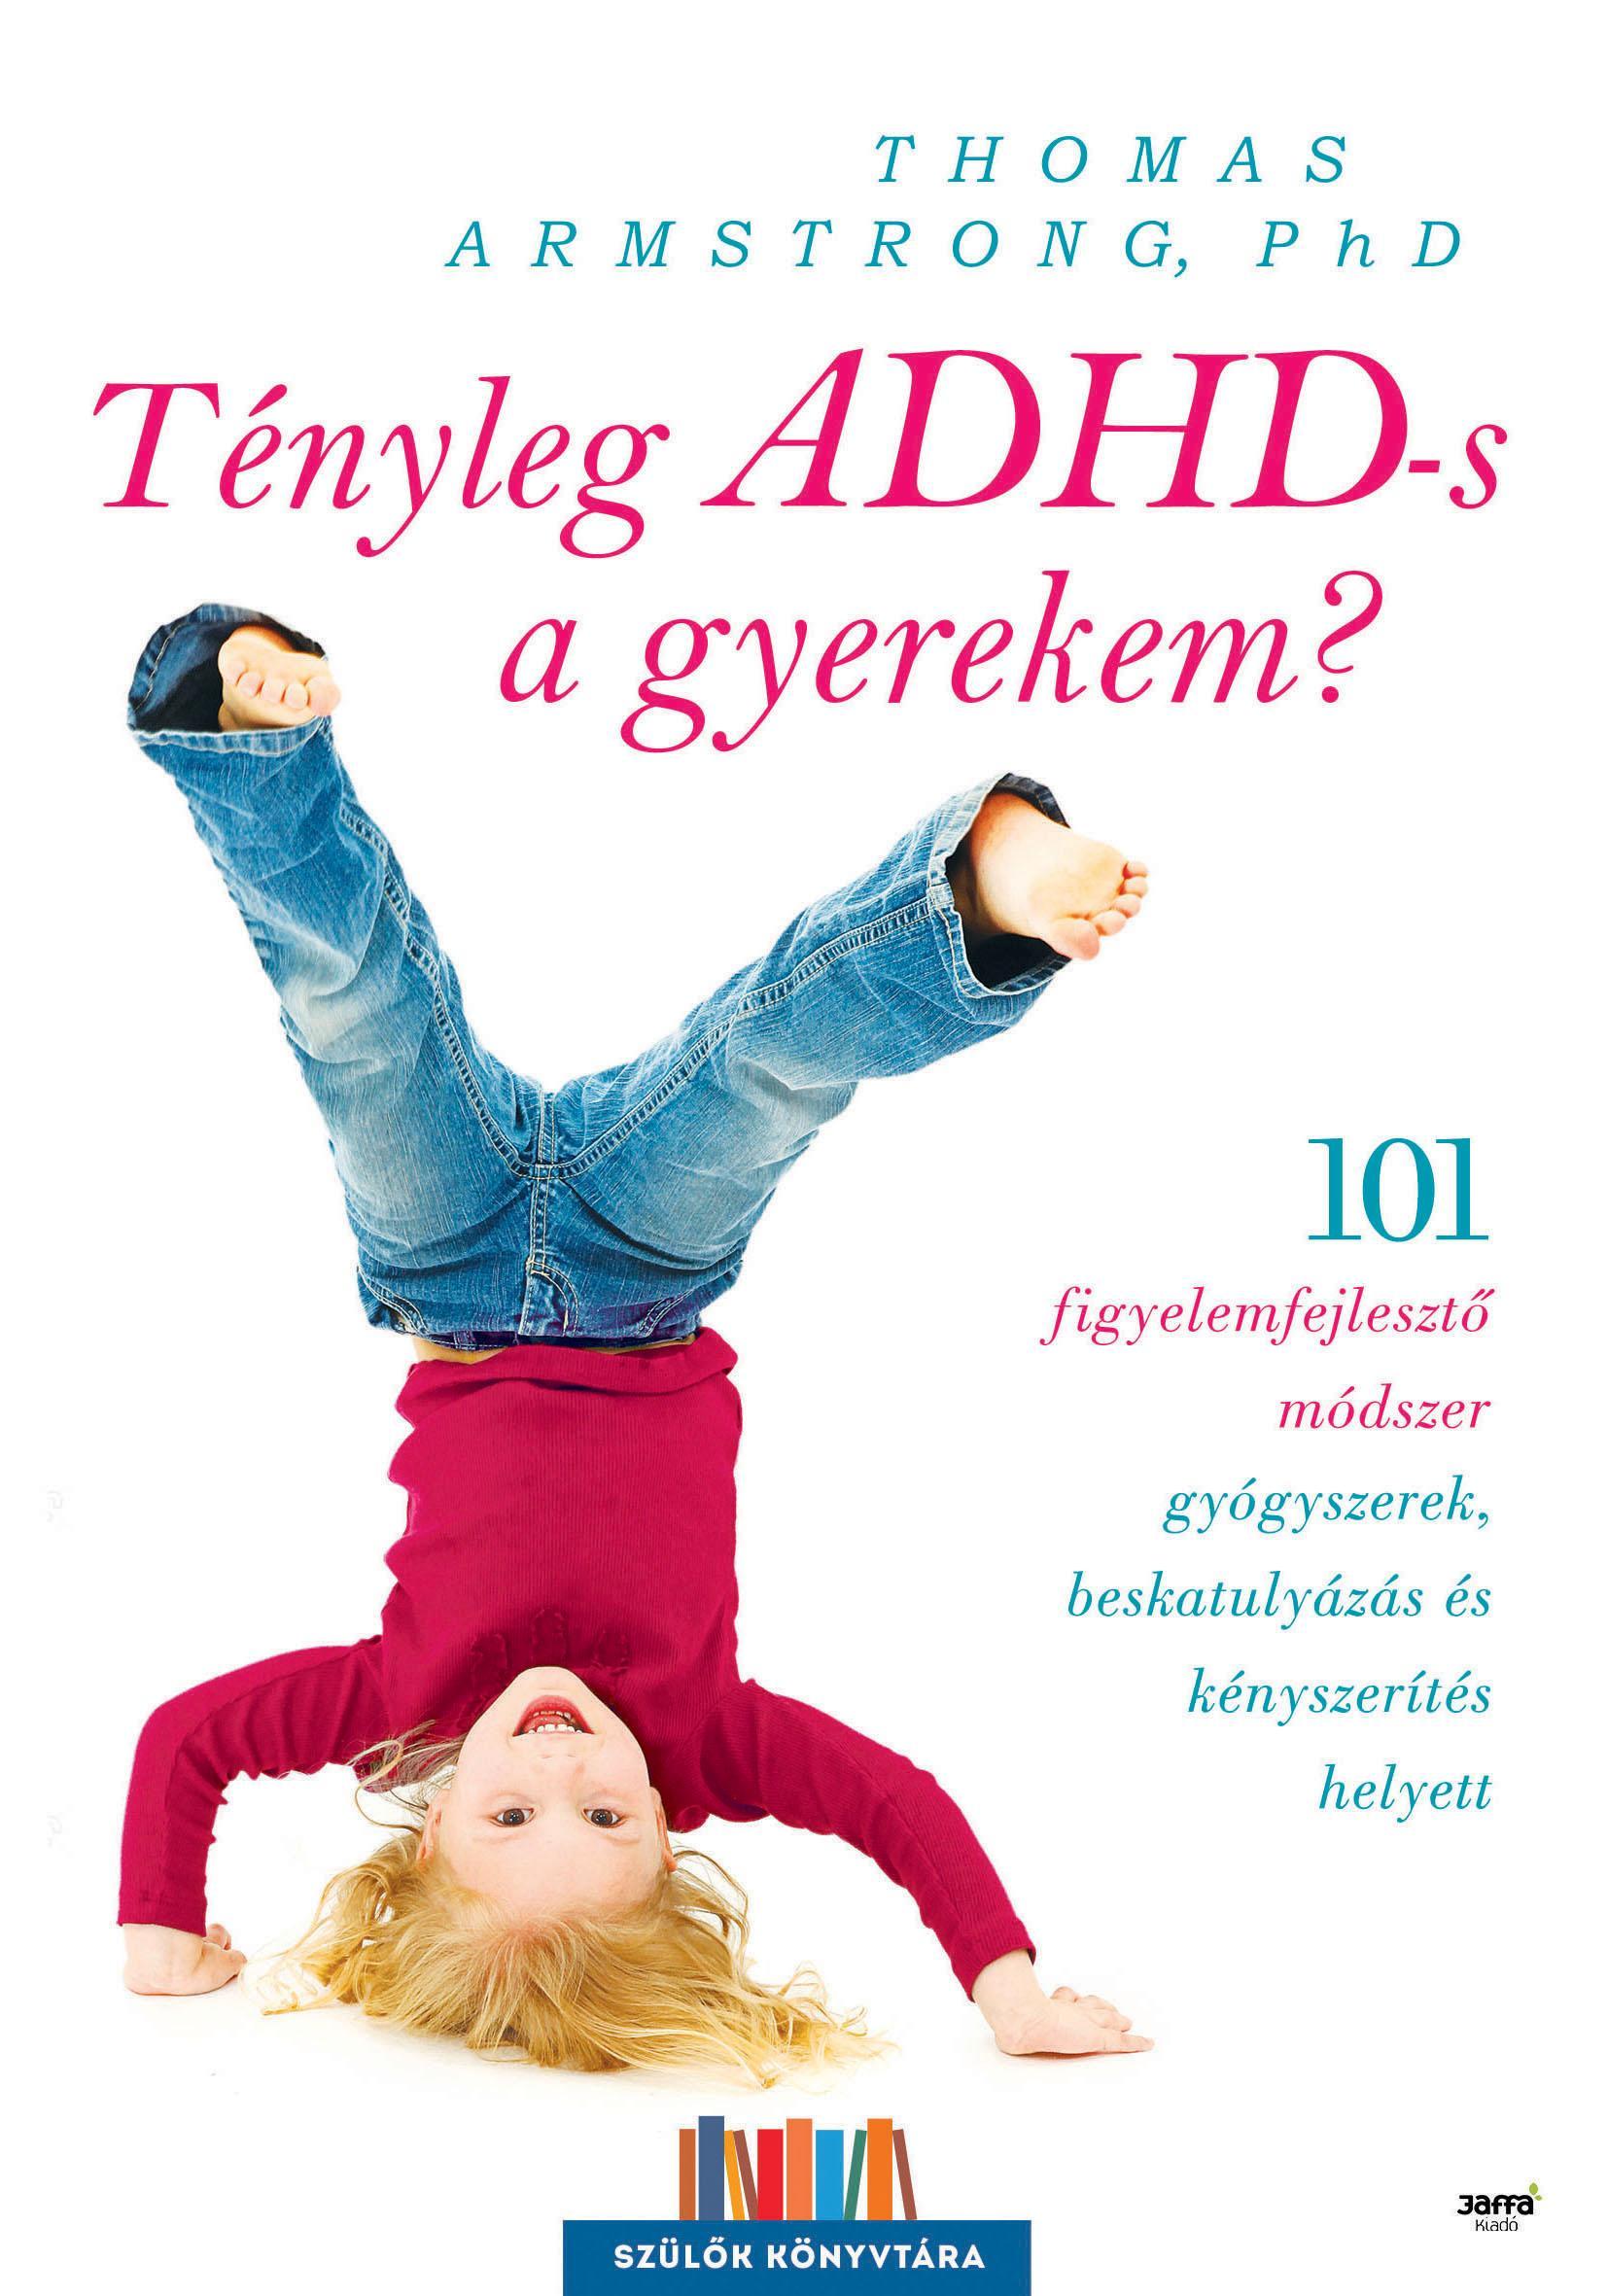 ARMSTRONG, THOMAS    PHD. - TÉNYLEG ADHD-S A GYEREKEM?